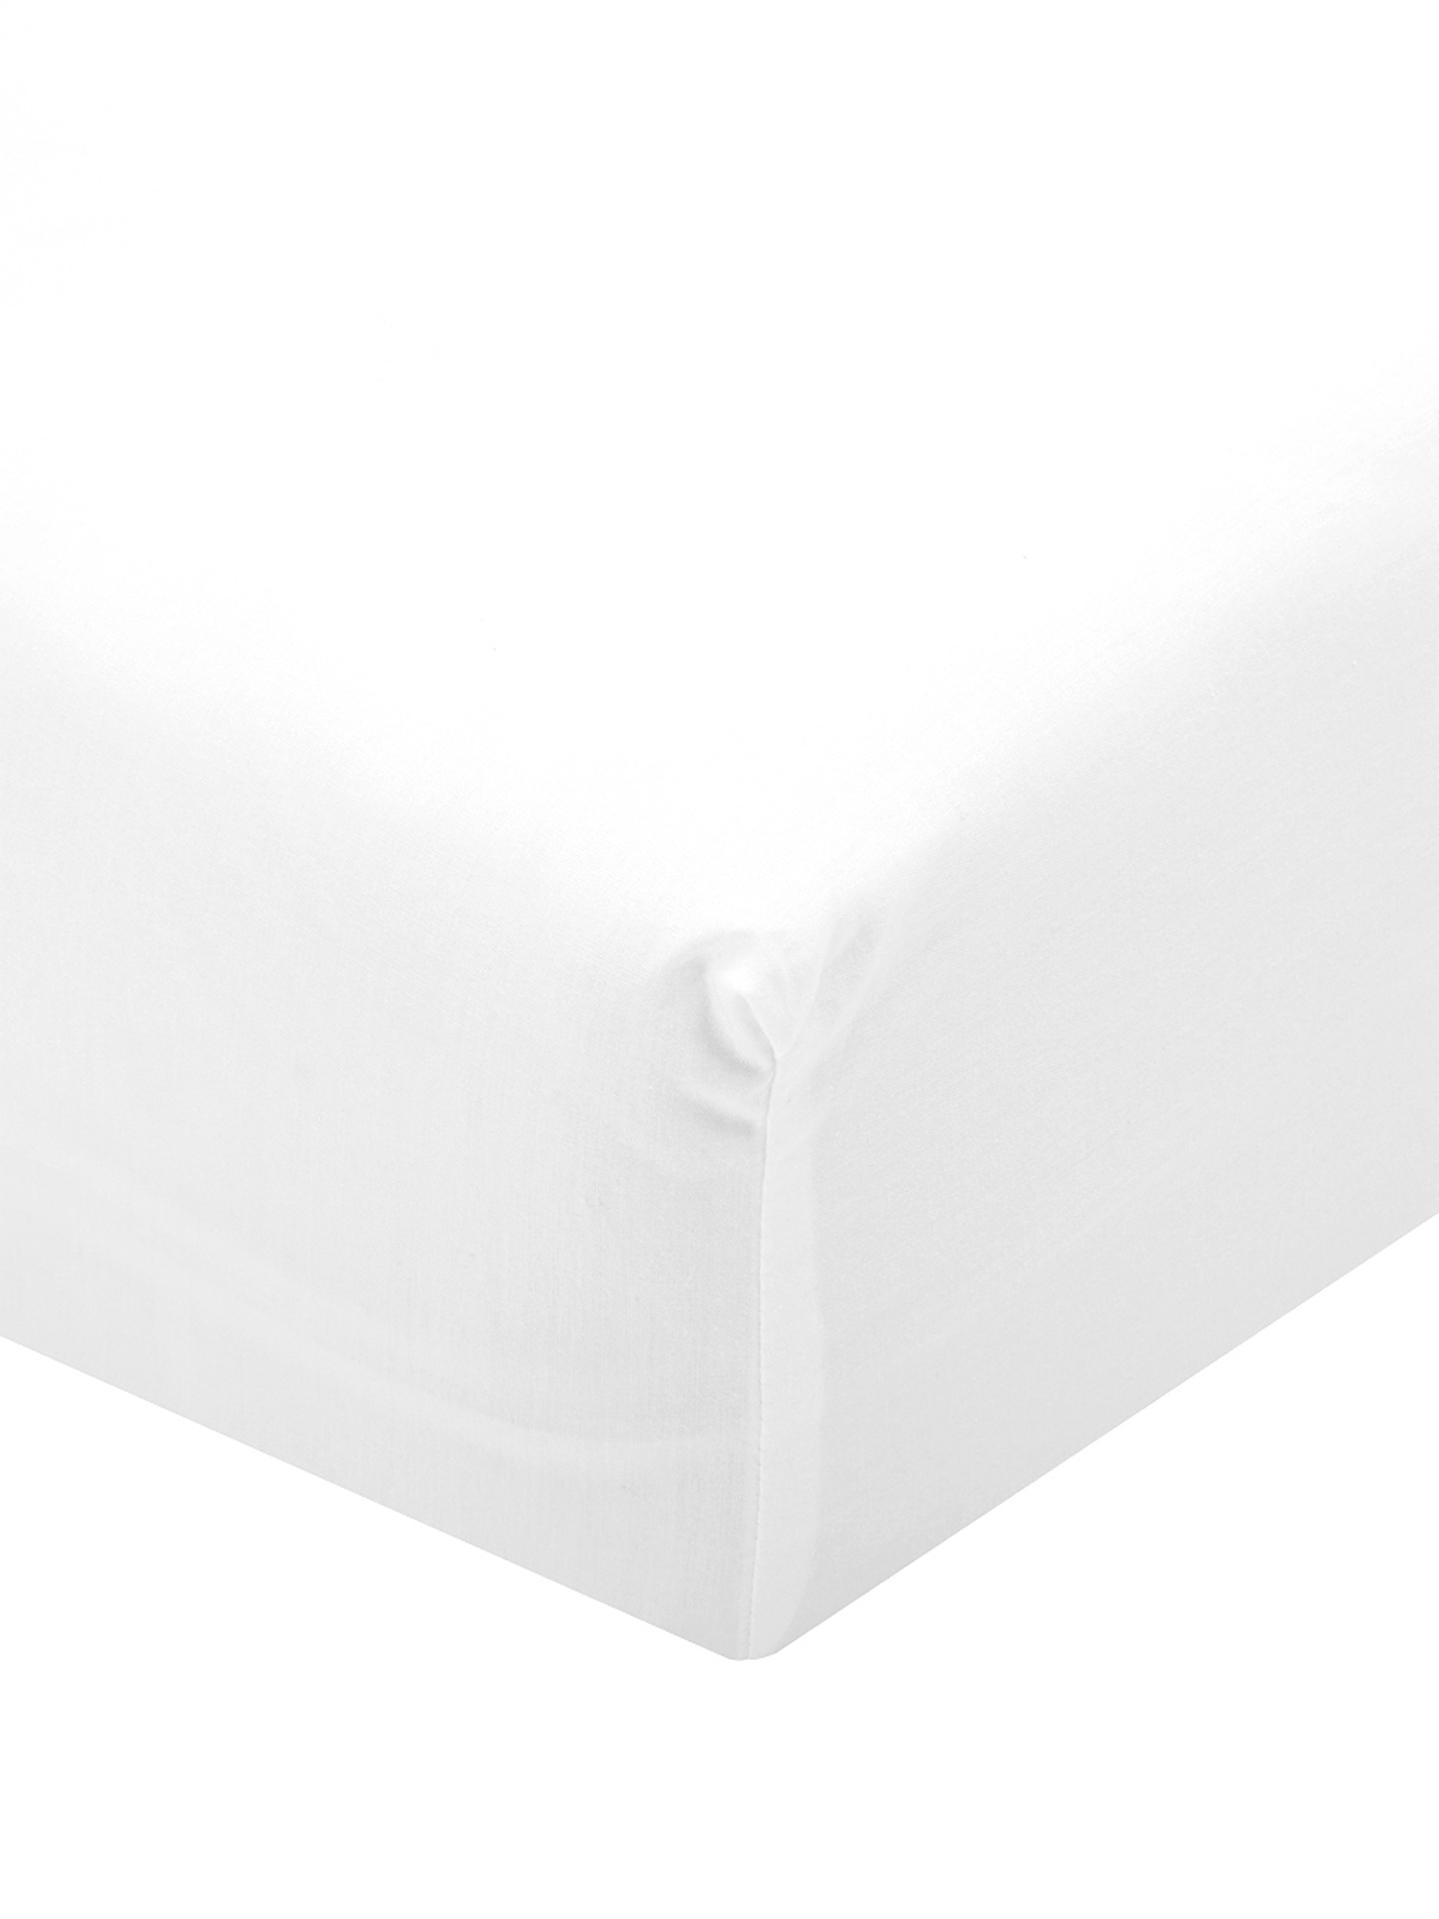 Sábana bajera de percal Elsie, Blanco, Cama 180 cm (180 x 200 cm)